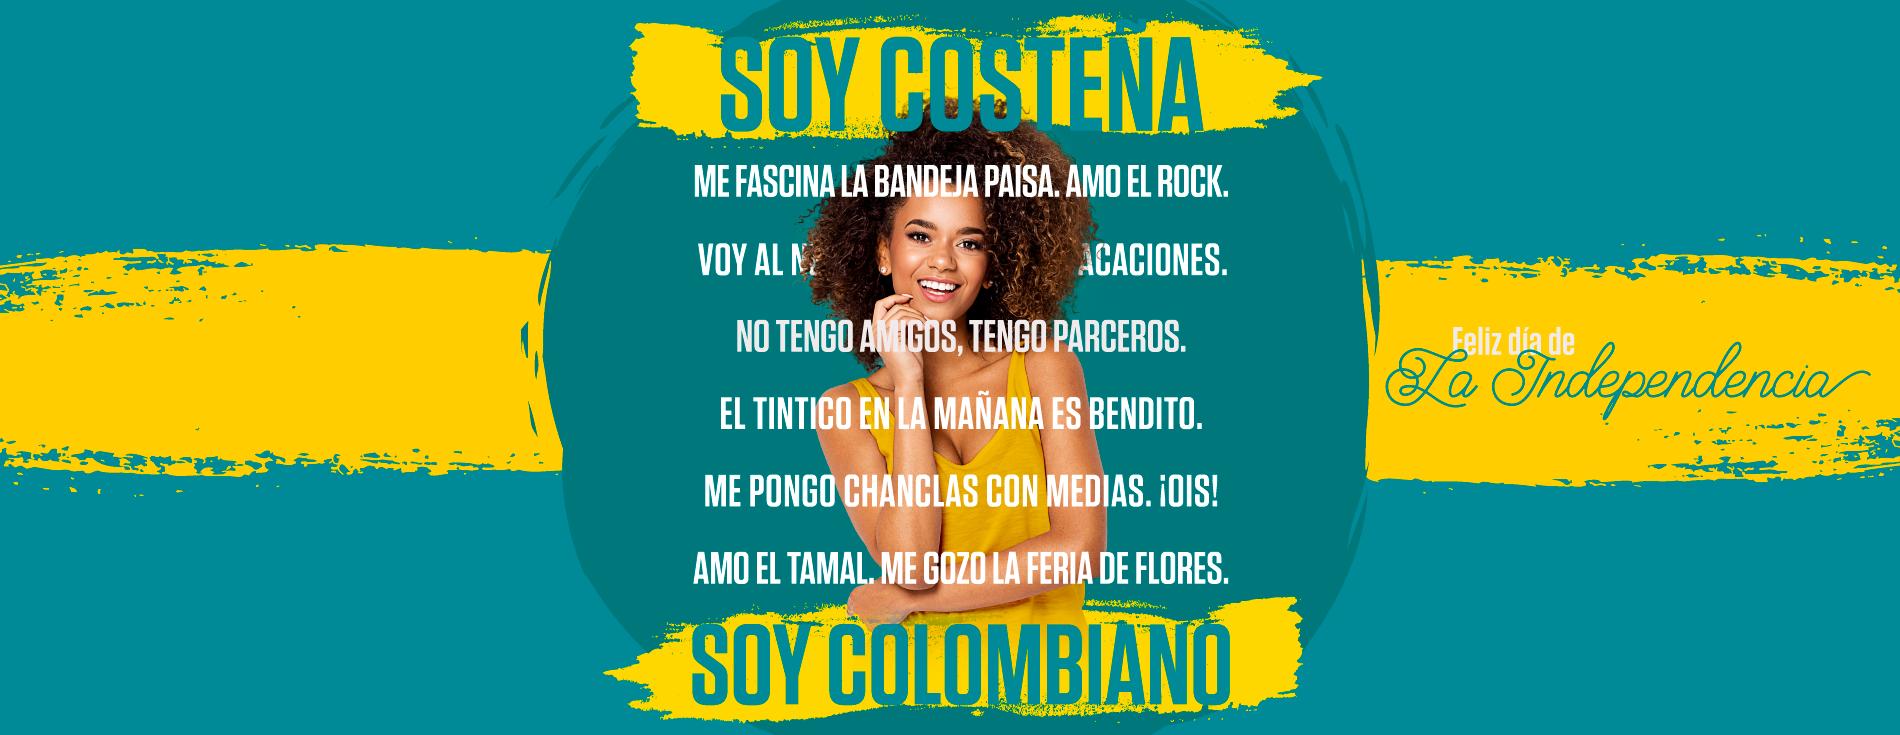 Independencia de Colombia - Wajiira